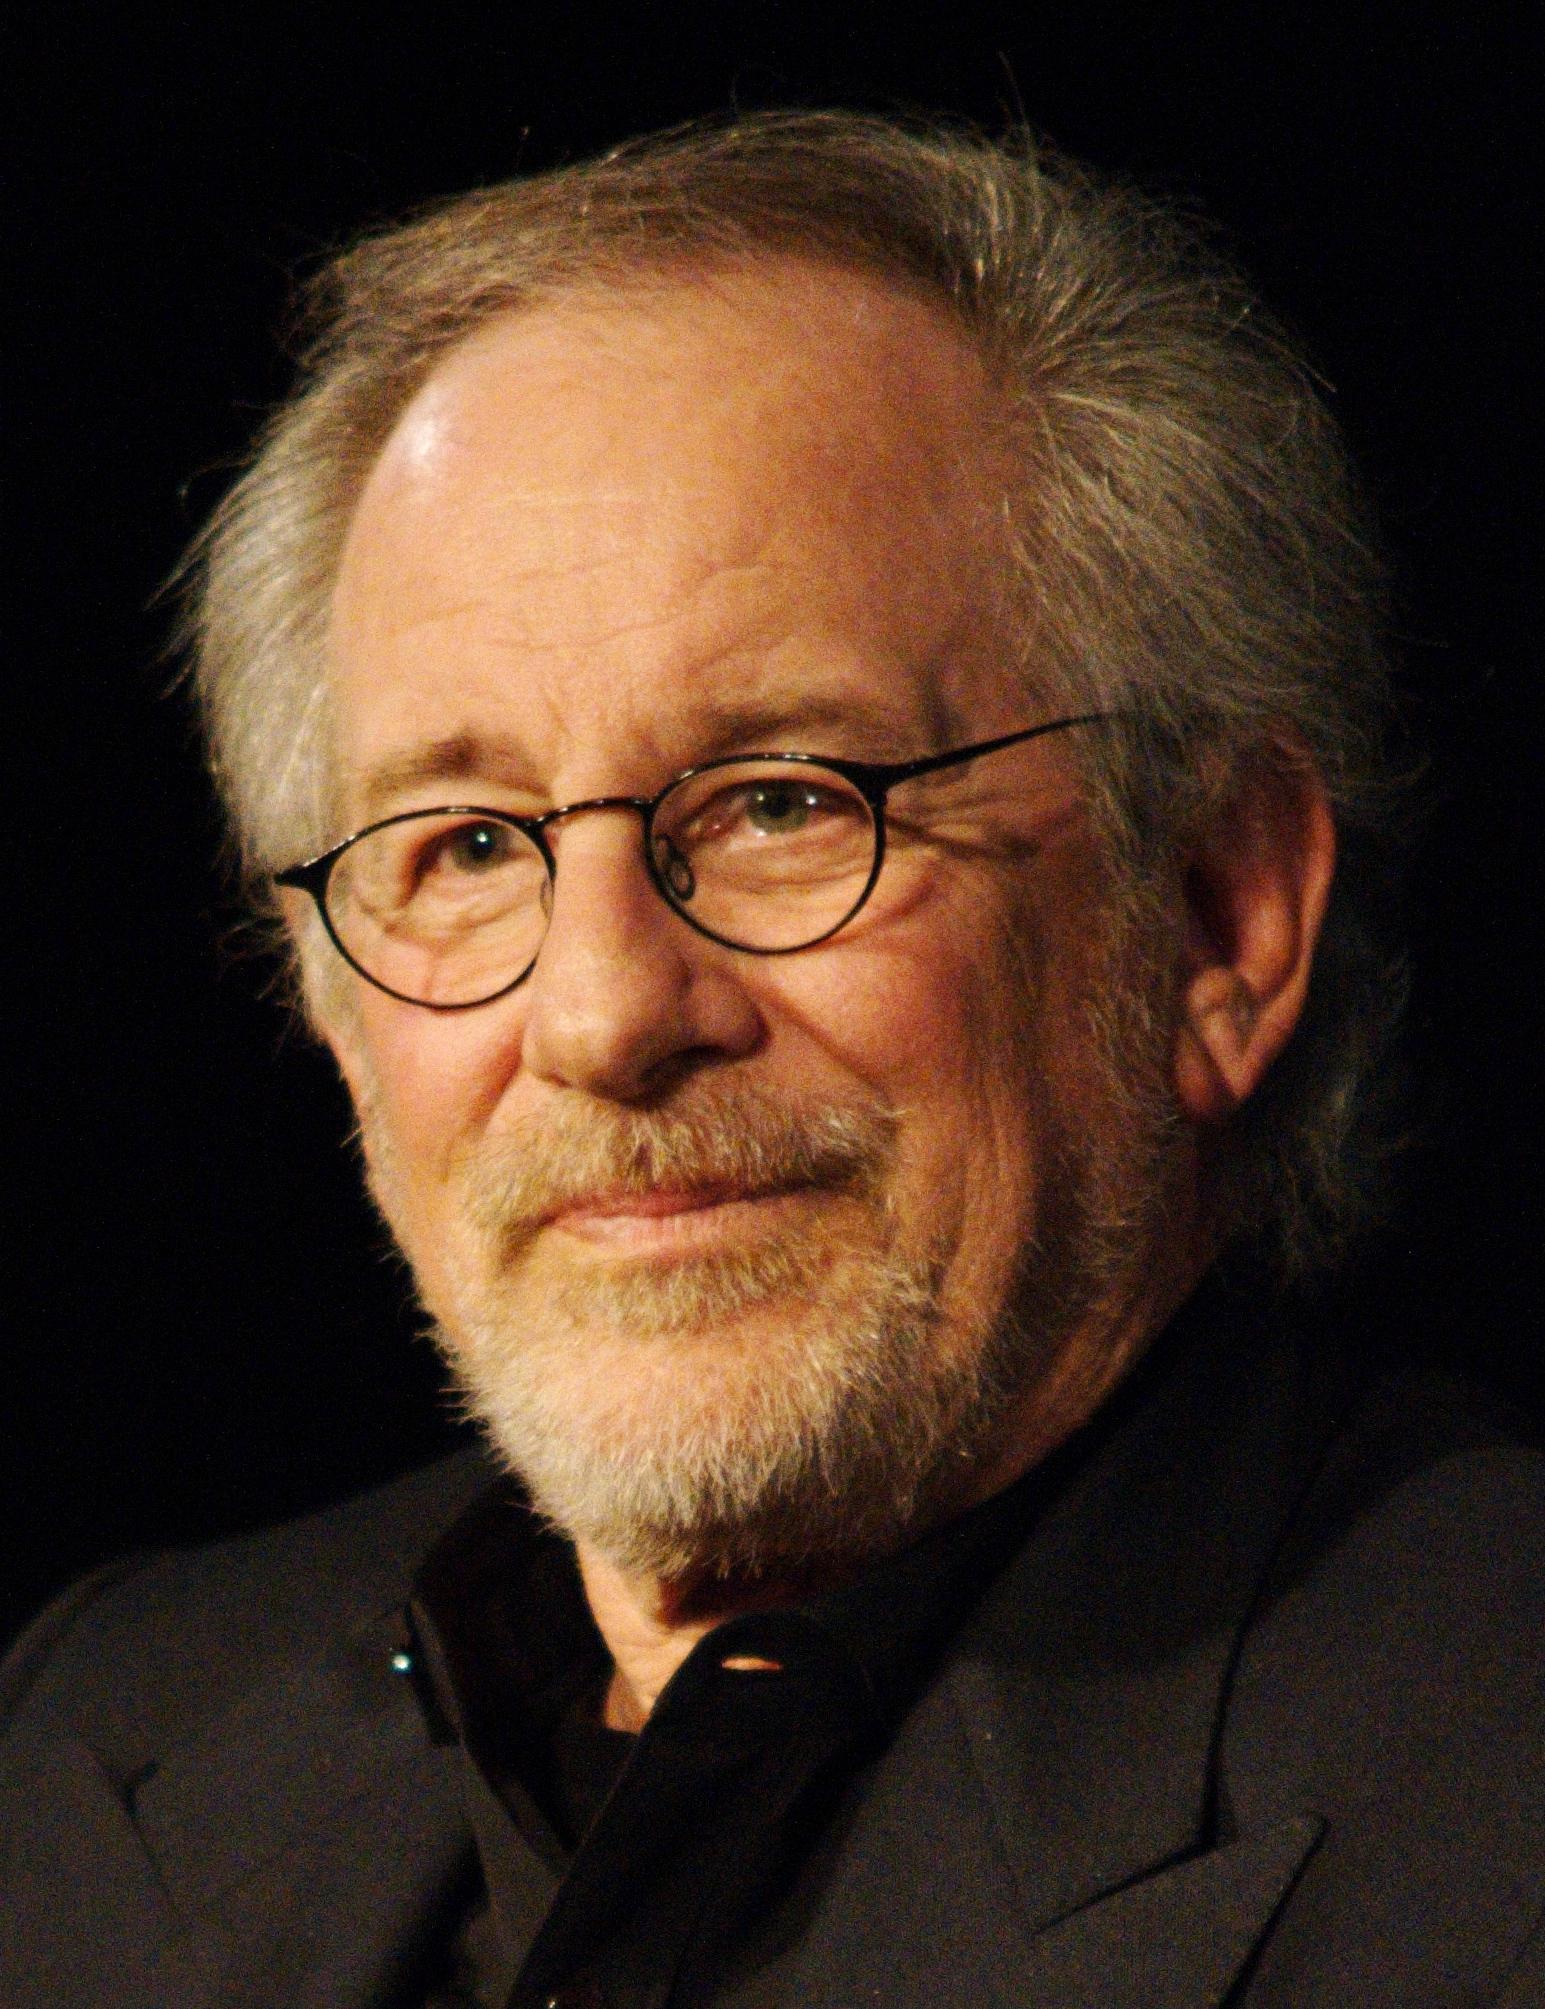 Steven Spielberg Masterclass Cinémathèque Française 2 cropped.jpg